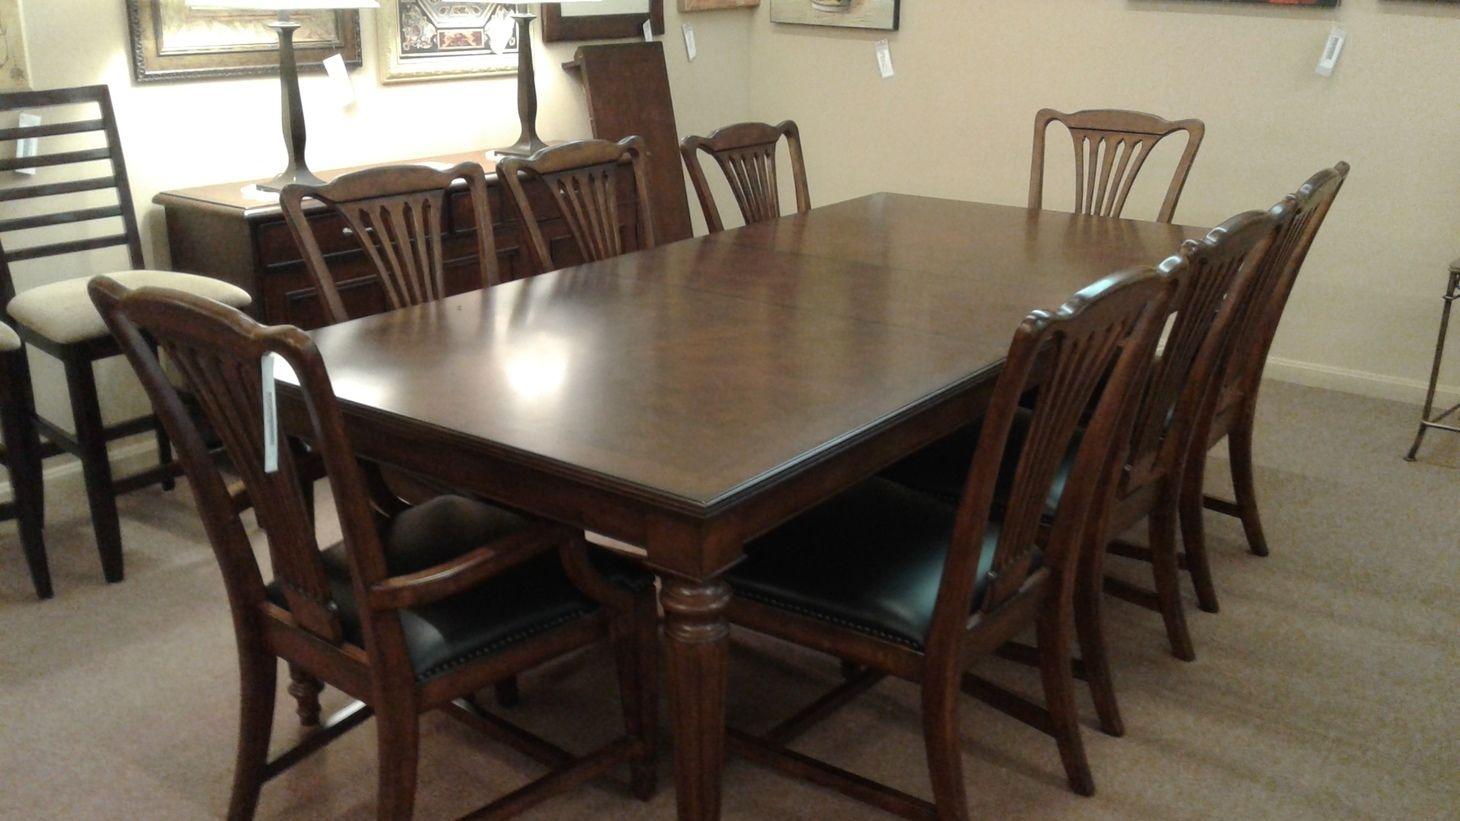 FINE FURNITURE DINING ROOM SET Delmarva Furniture